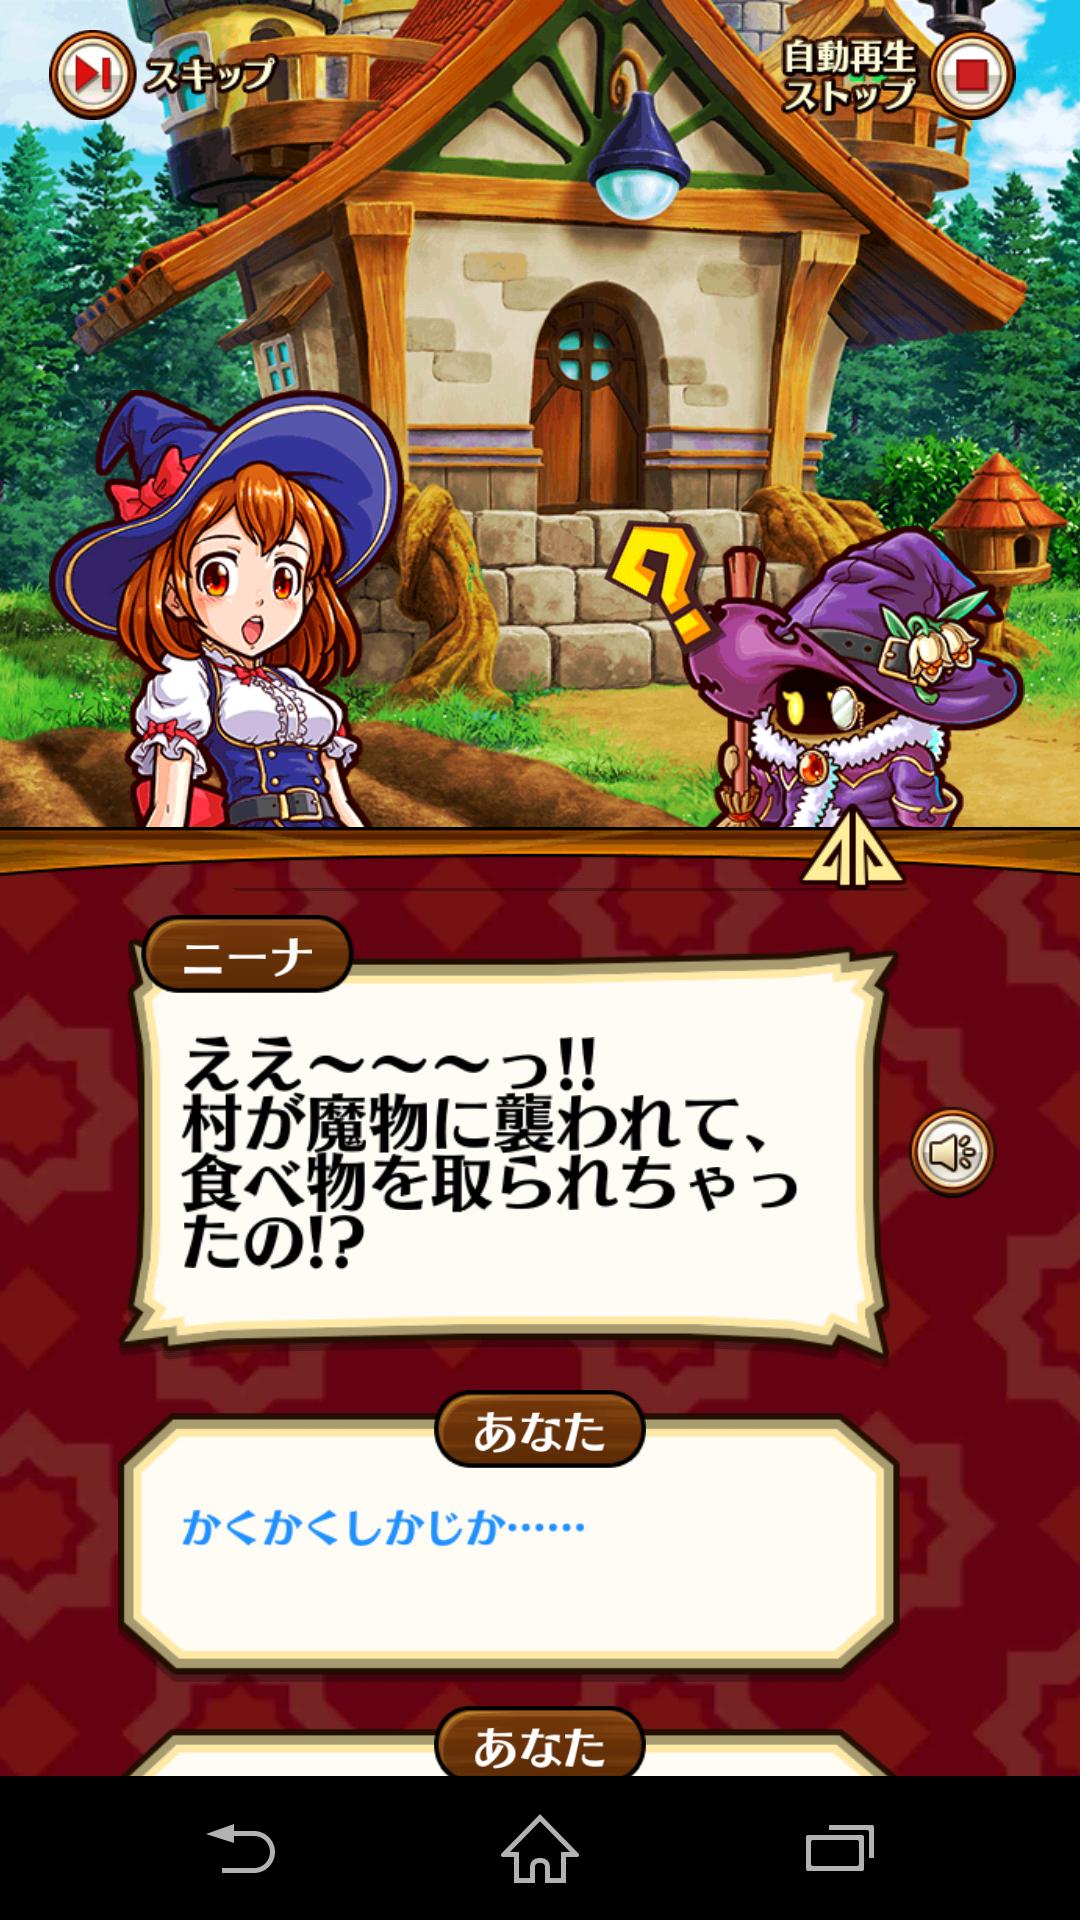 androidアプリ 合体RPG 魔女のニーナとツチクレの戦士攻略スクリーンショット1